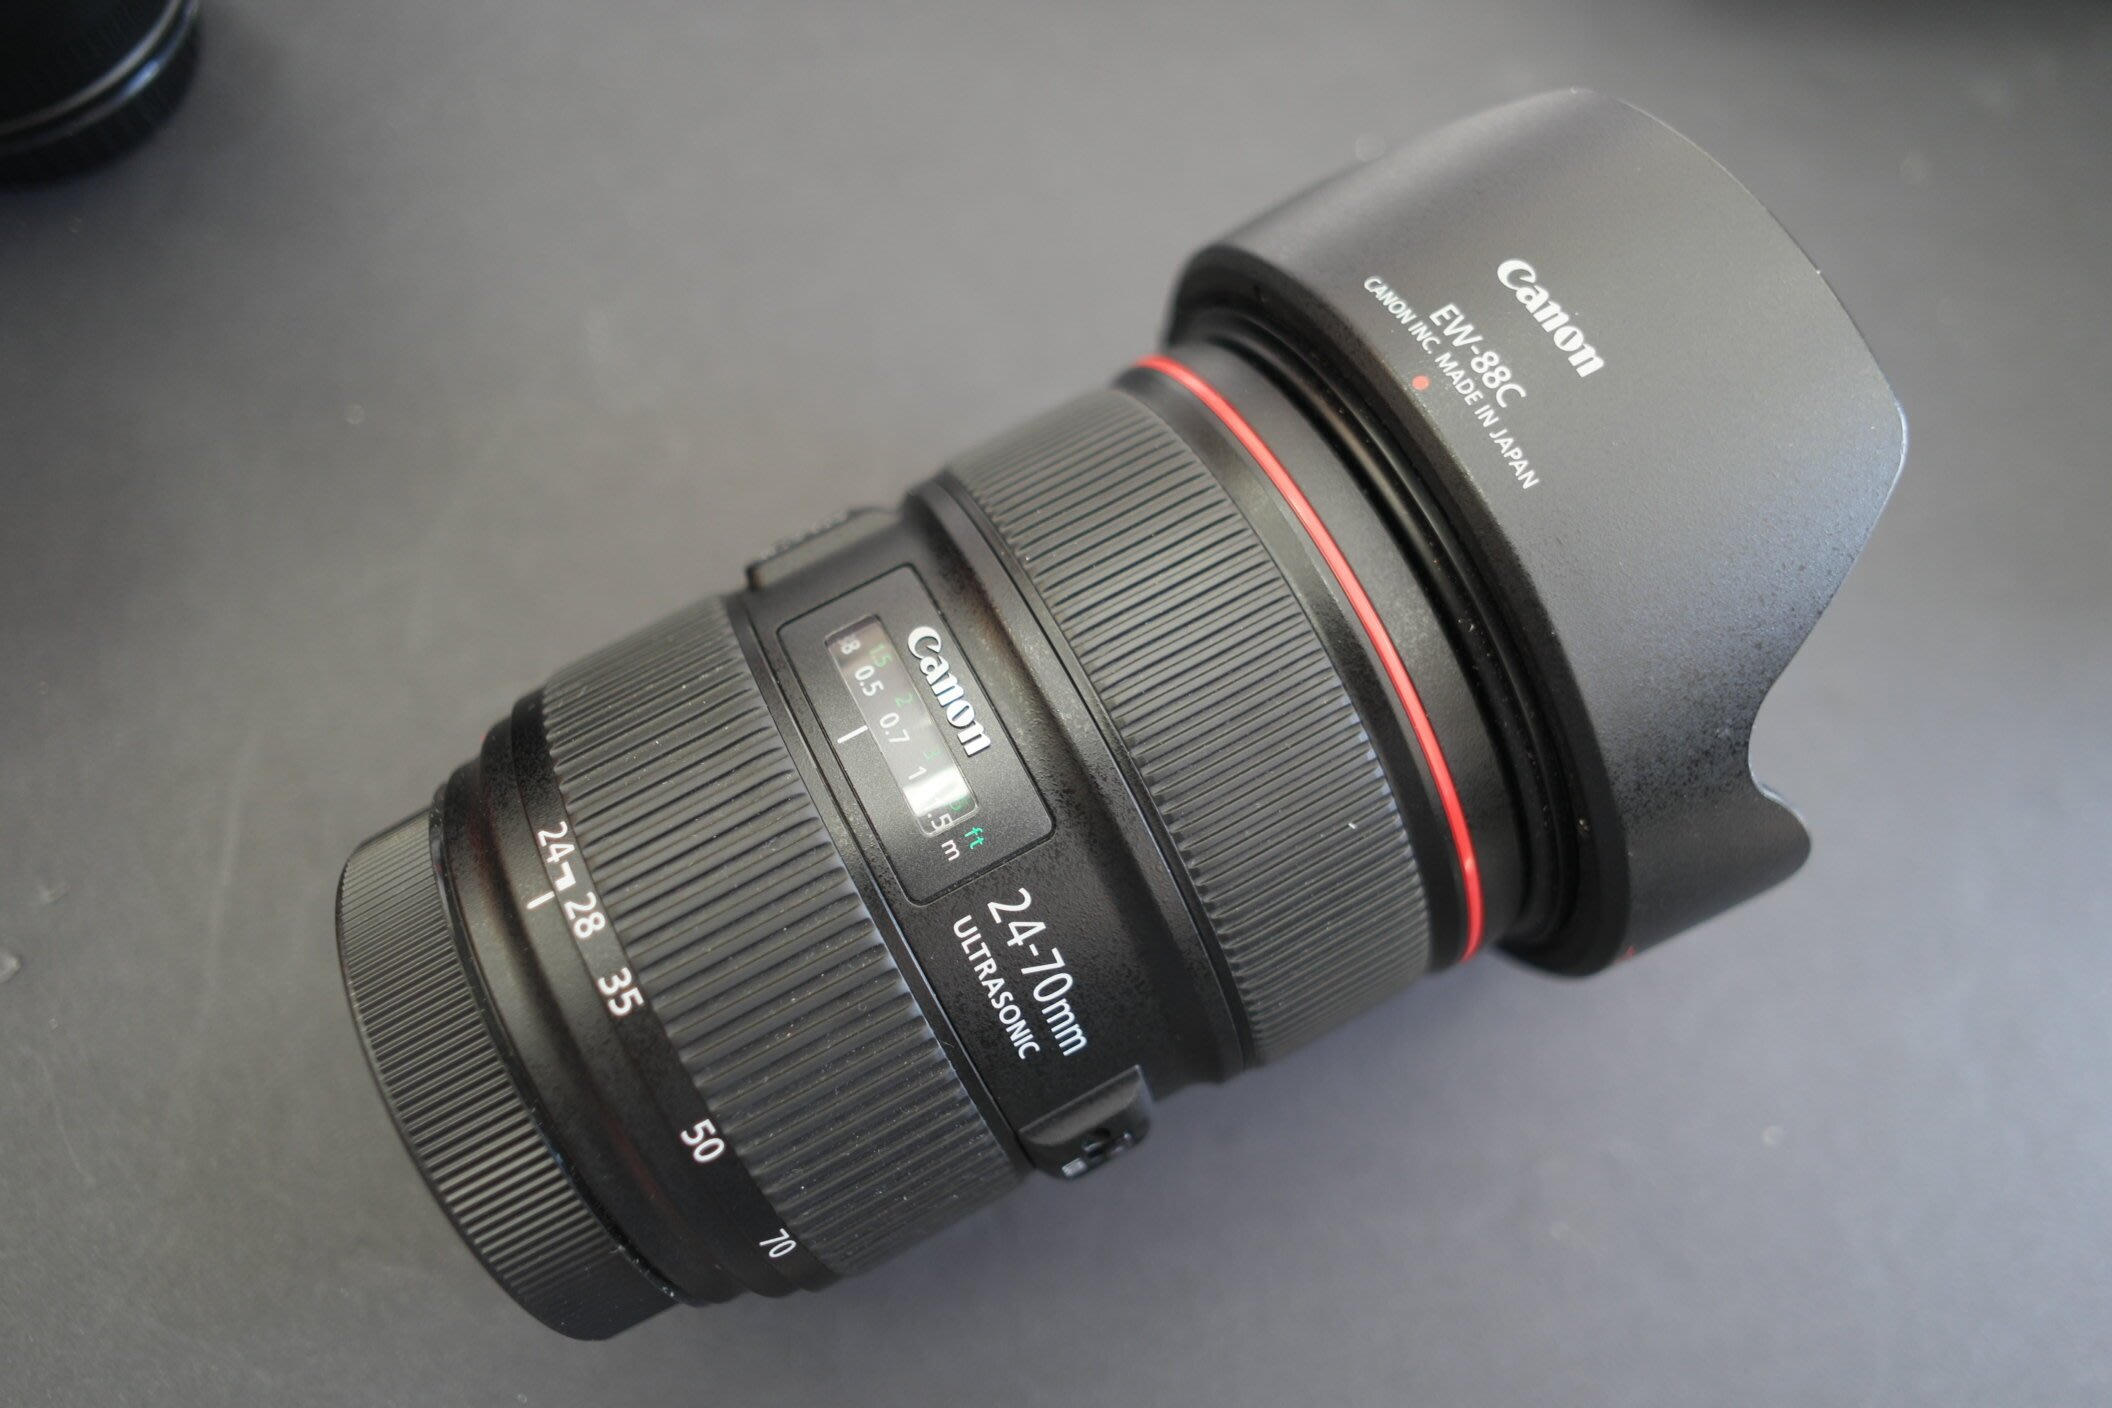 Canon 24-70mm F2.8 L II 平輸貨 盒裝配件齊全